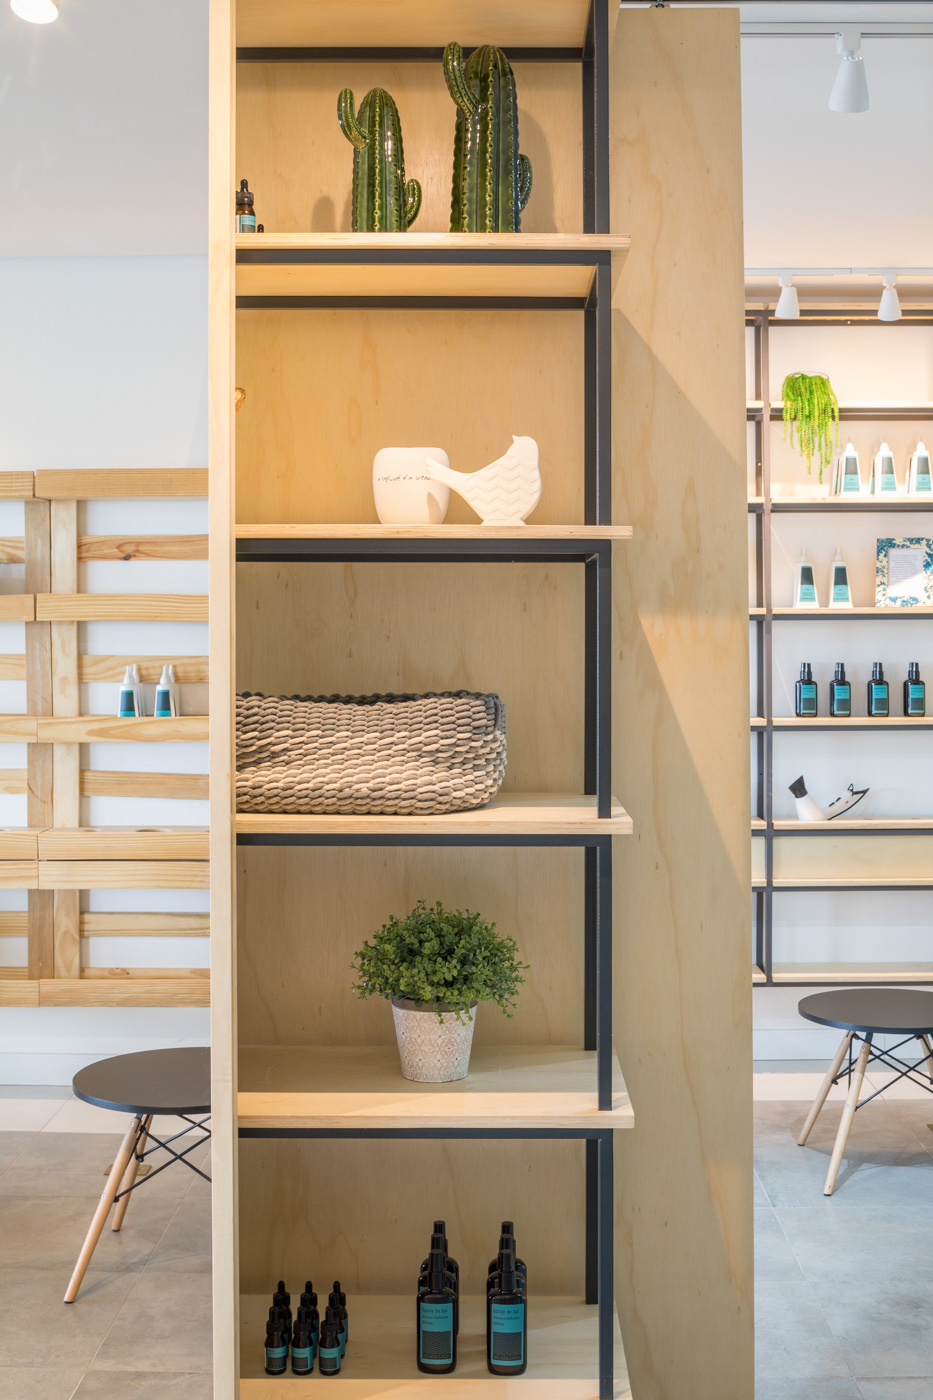 Estúdio-Mova-arquitetura-interiores-comercial-foto-haruo-mikami_059_Baixa.jpg